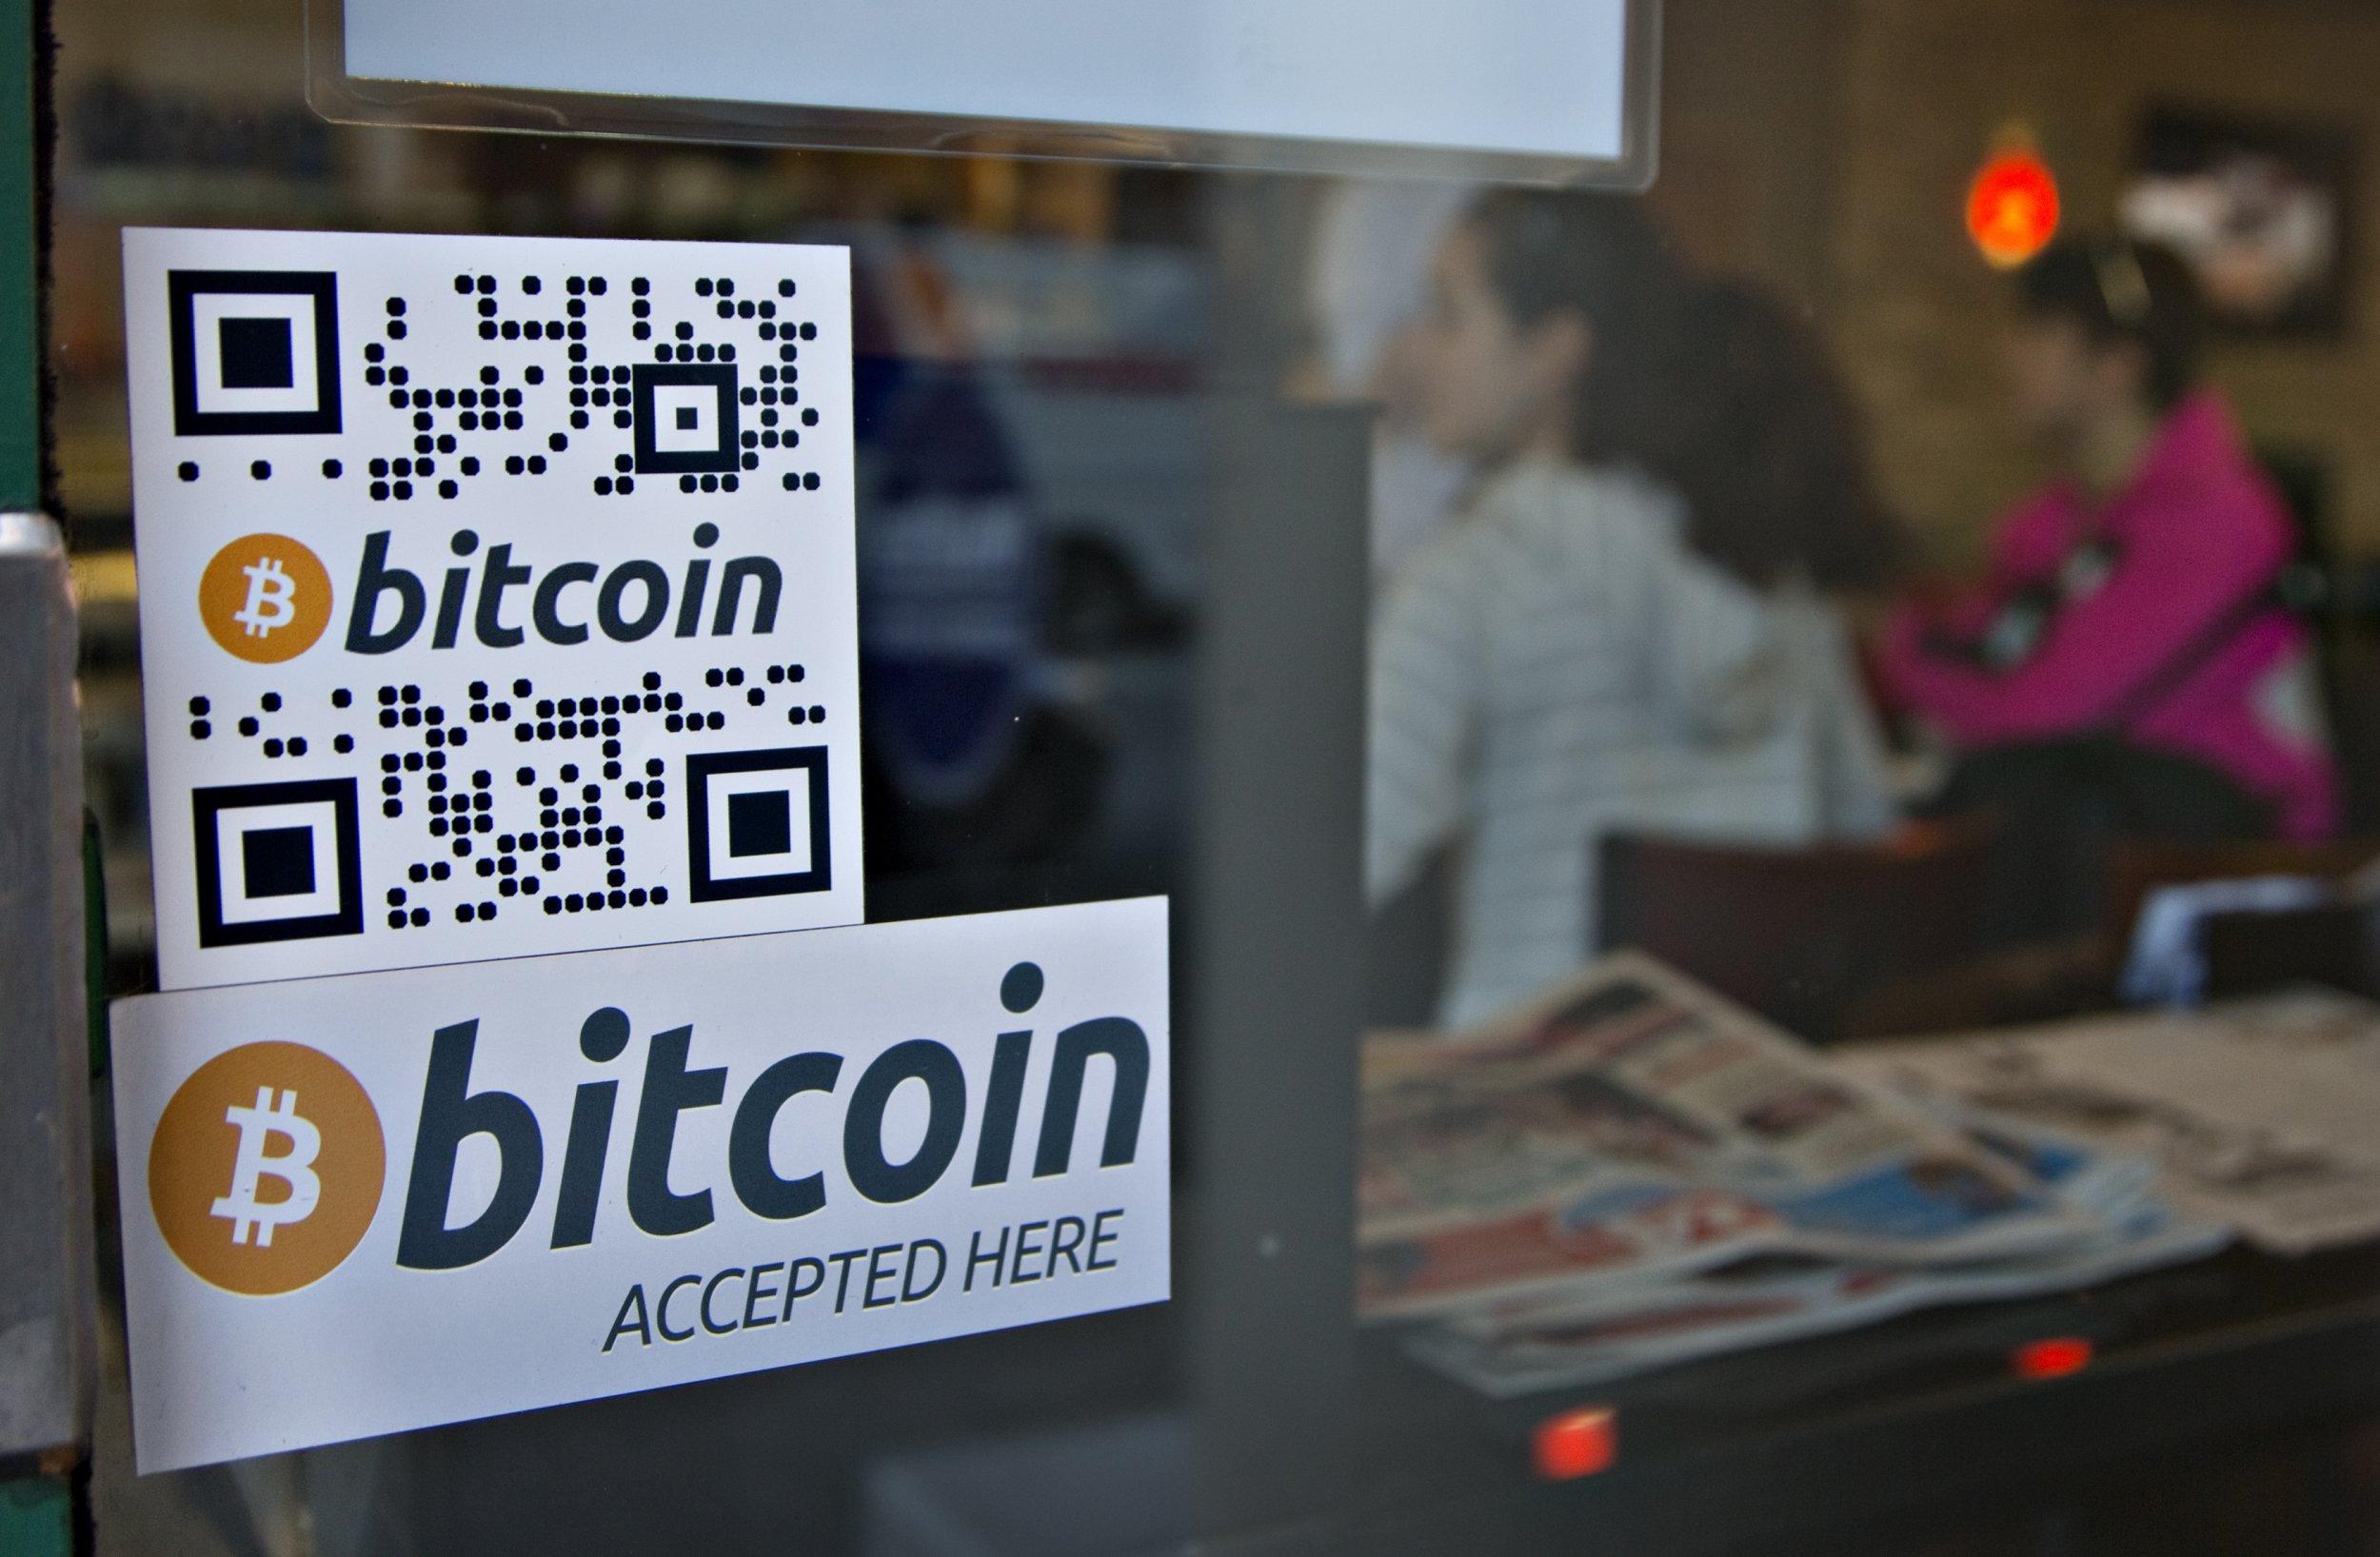 alaninda lider 3 sirket bitcoin btc kabul etmeyi planliyor 8